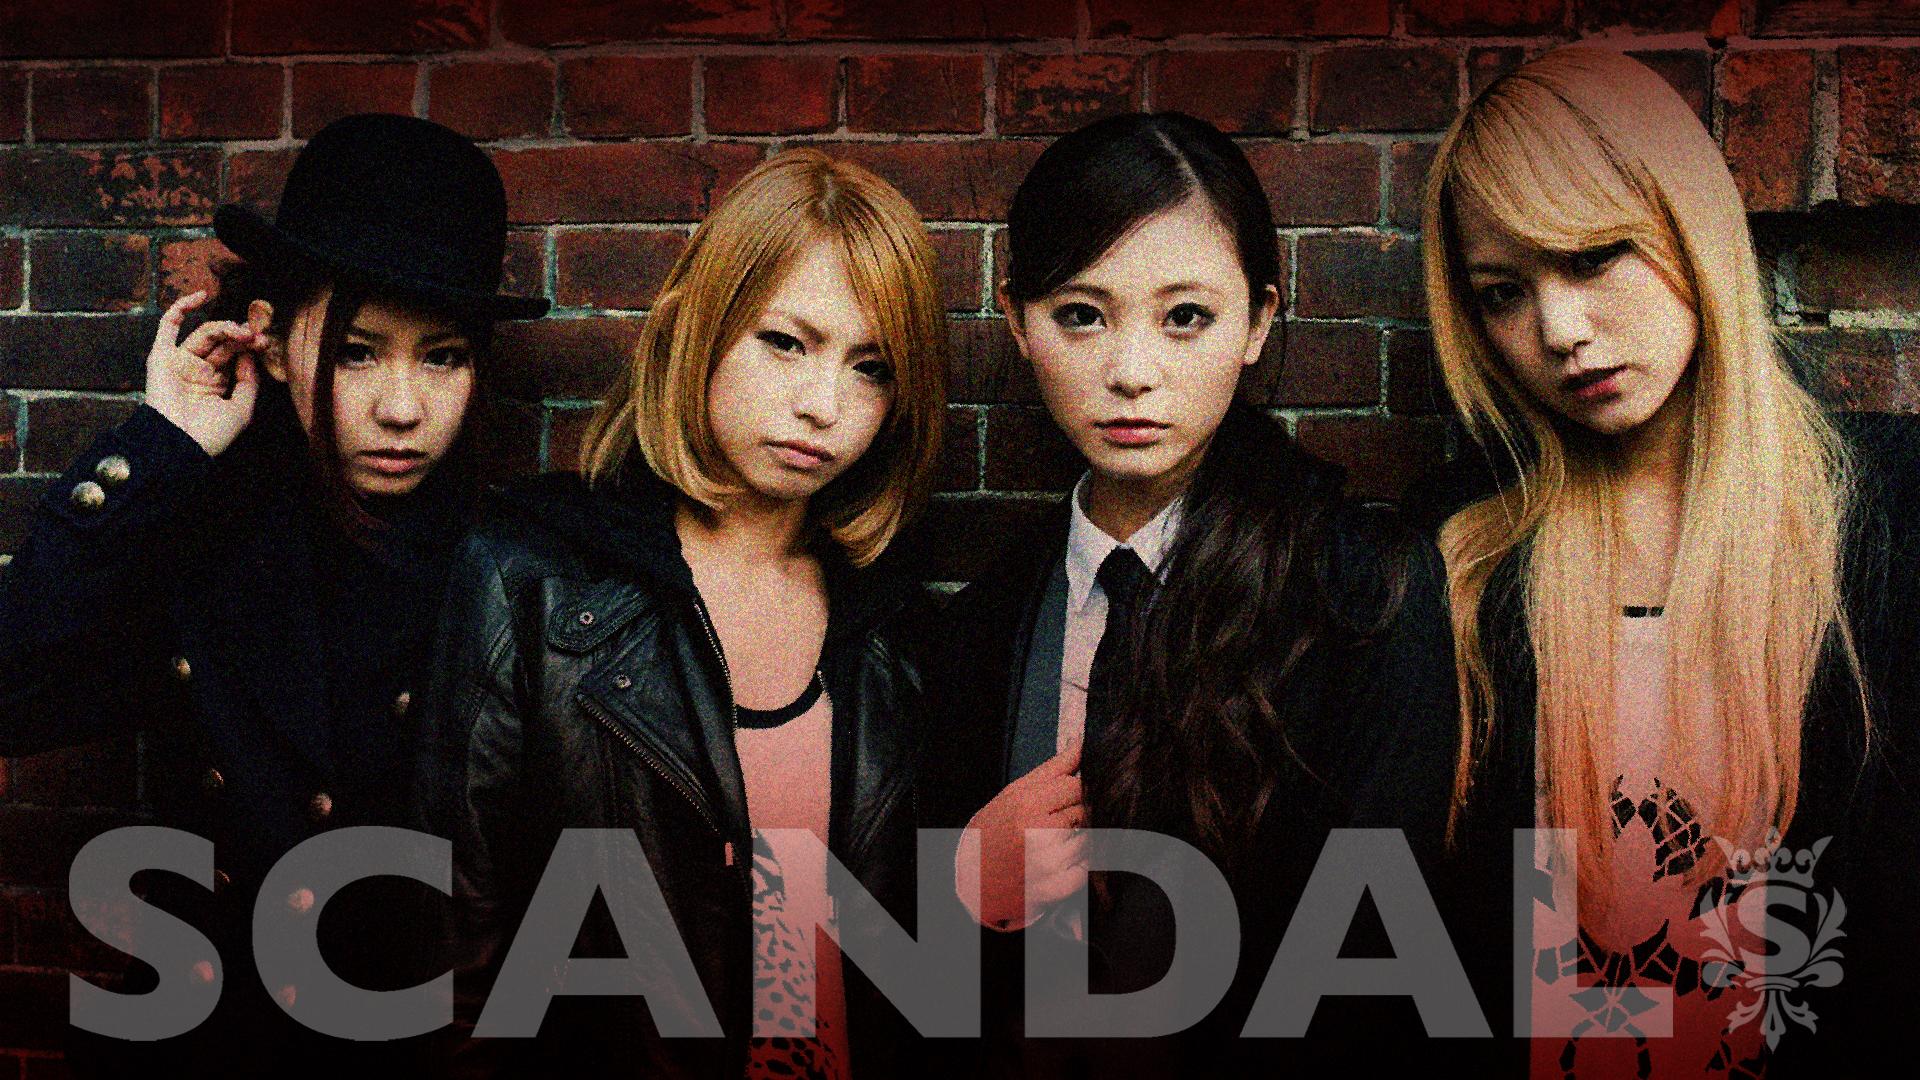 SCANDAL (日本のバンド)の画像 p1_16